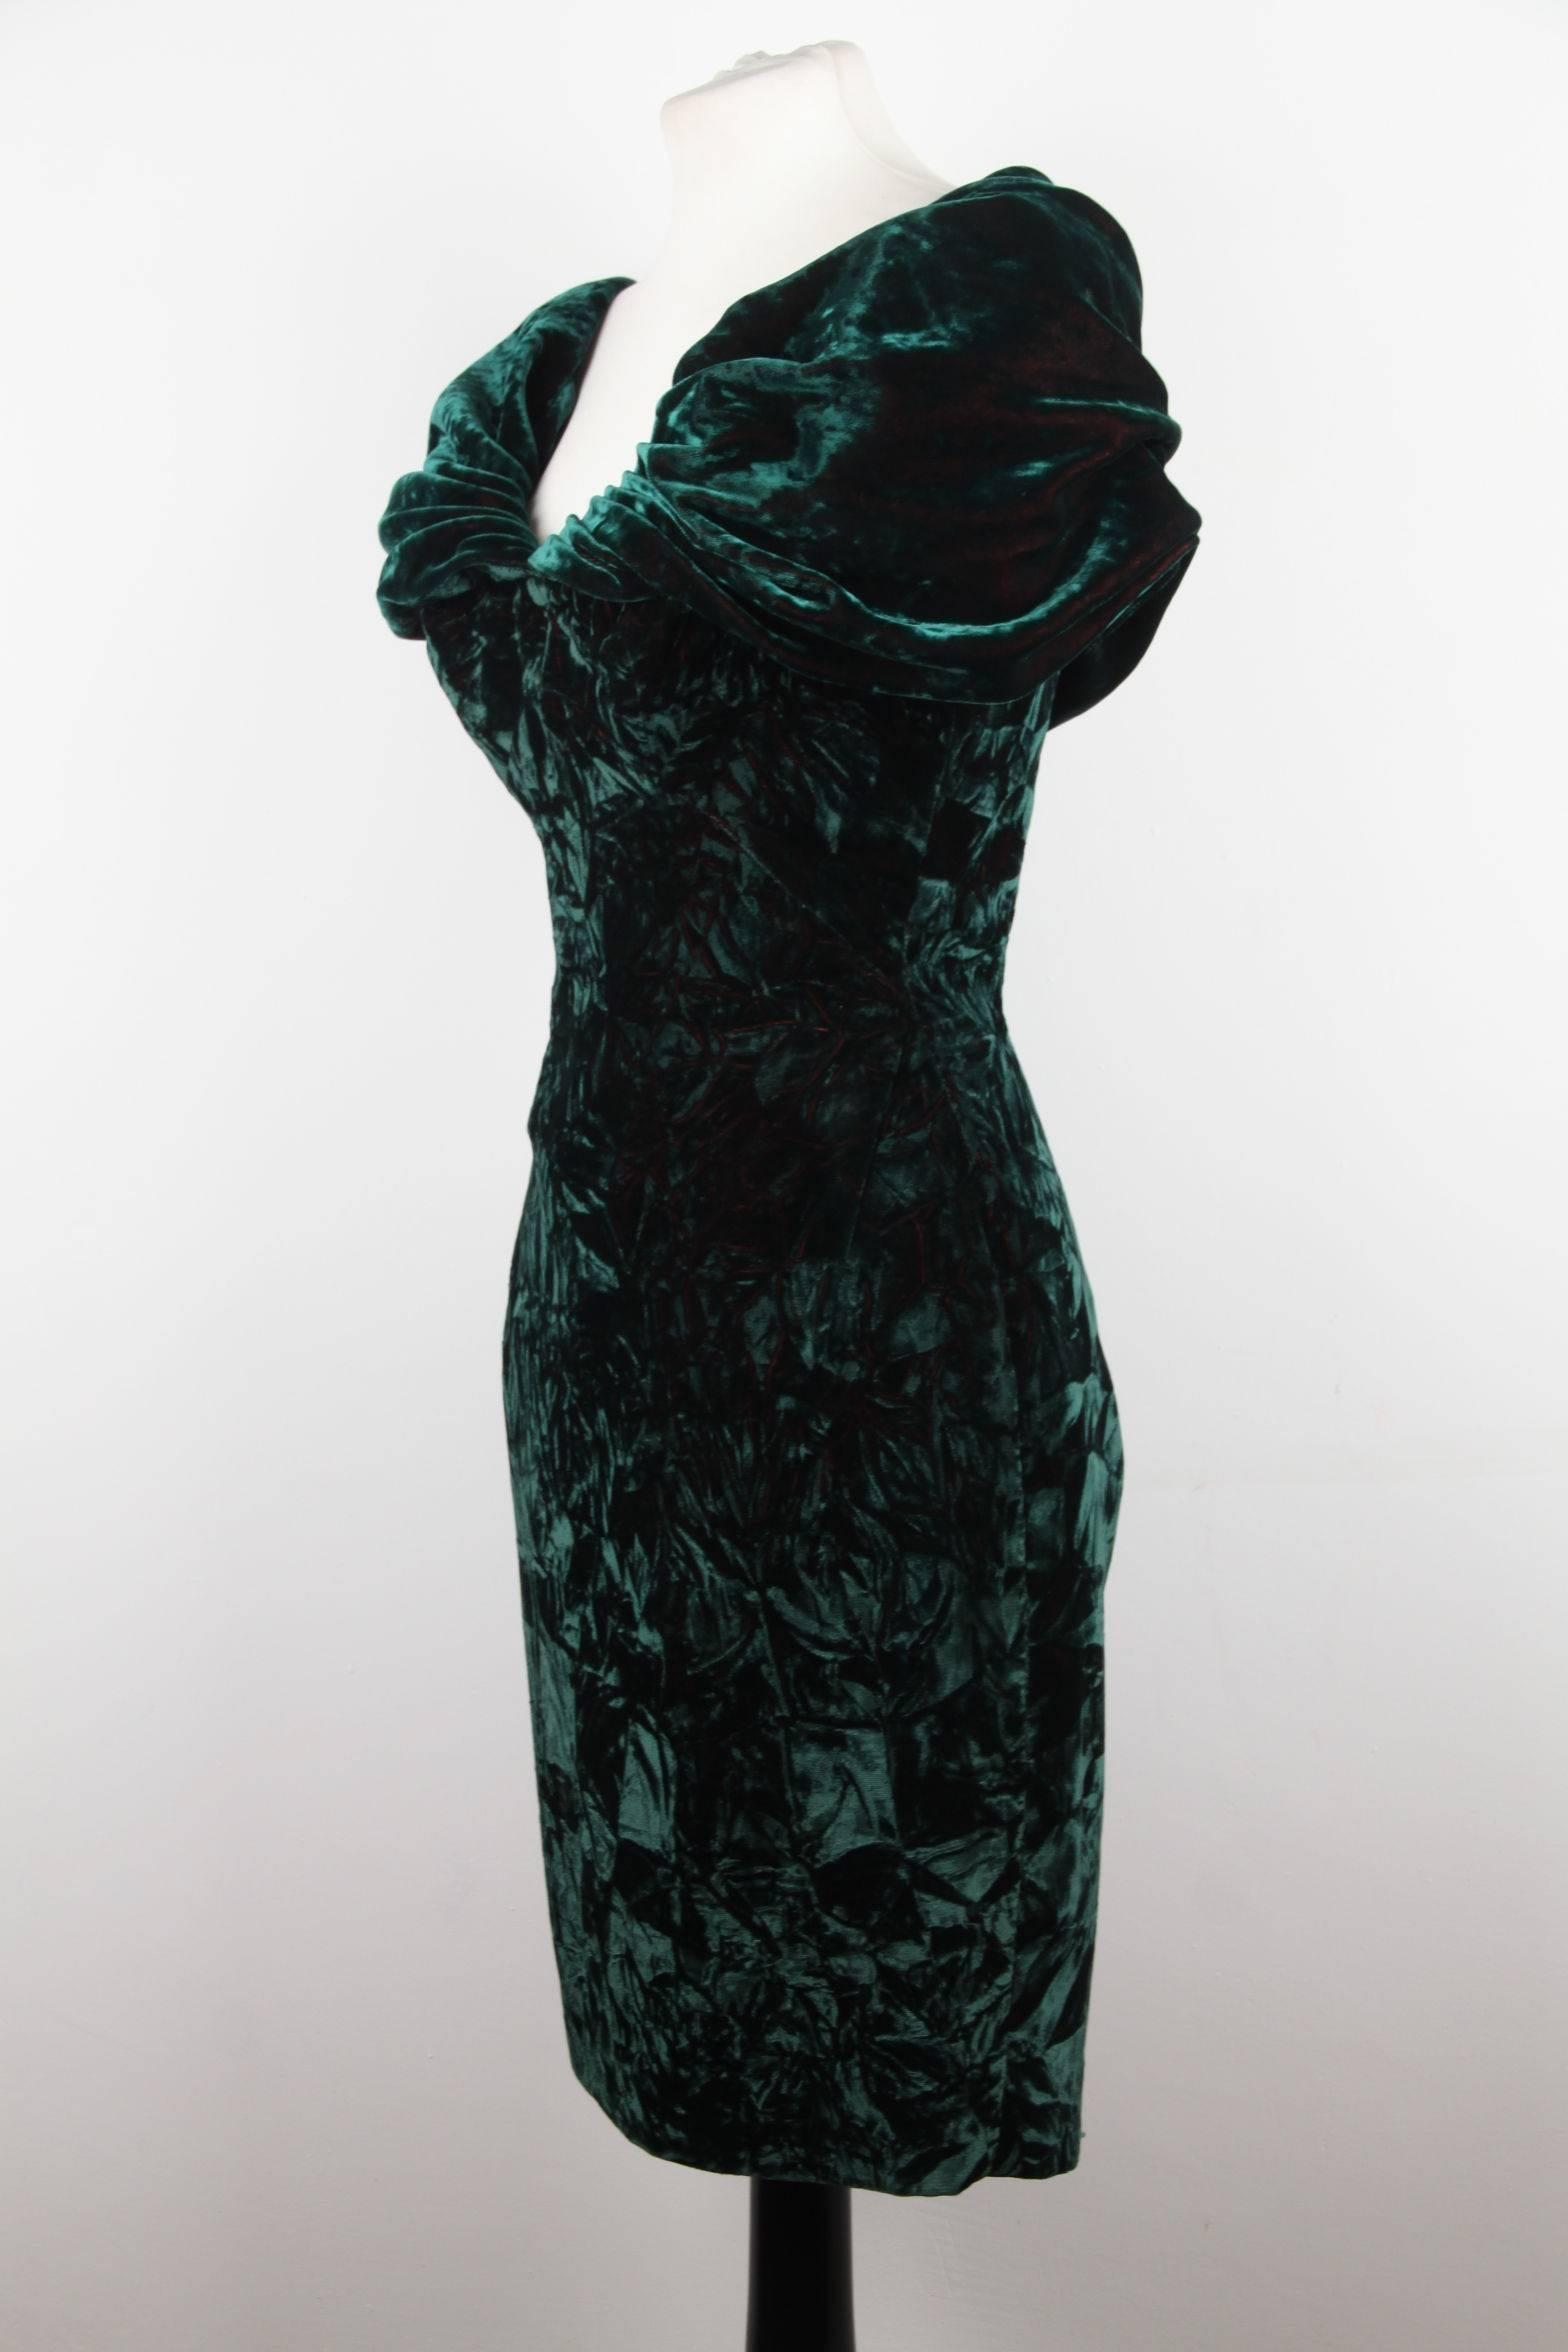 828c9573dcf0 ANTONY PRICE Vintage Green Velvet OFF SHOULDER Mini DRESS Size 10 UK For  Sale at 1stdibs